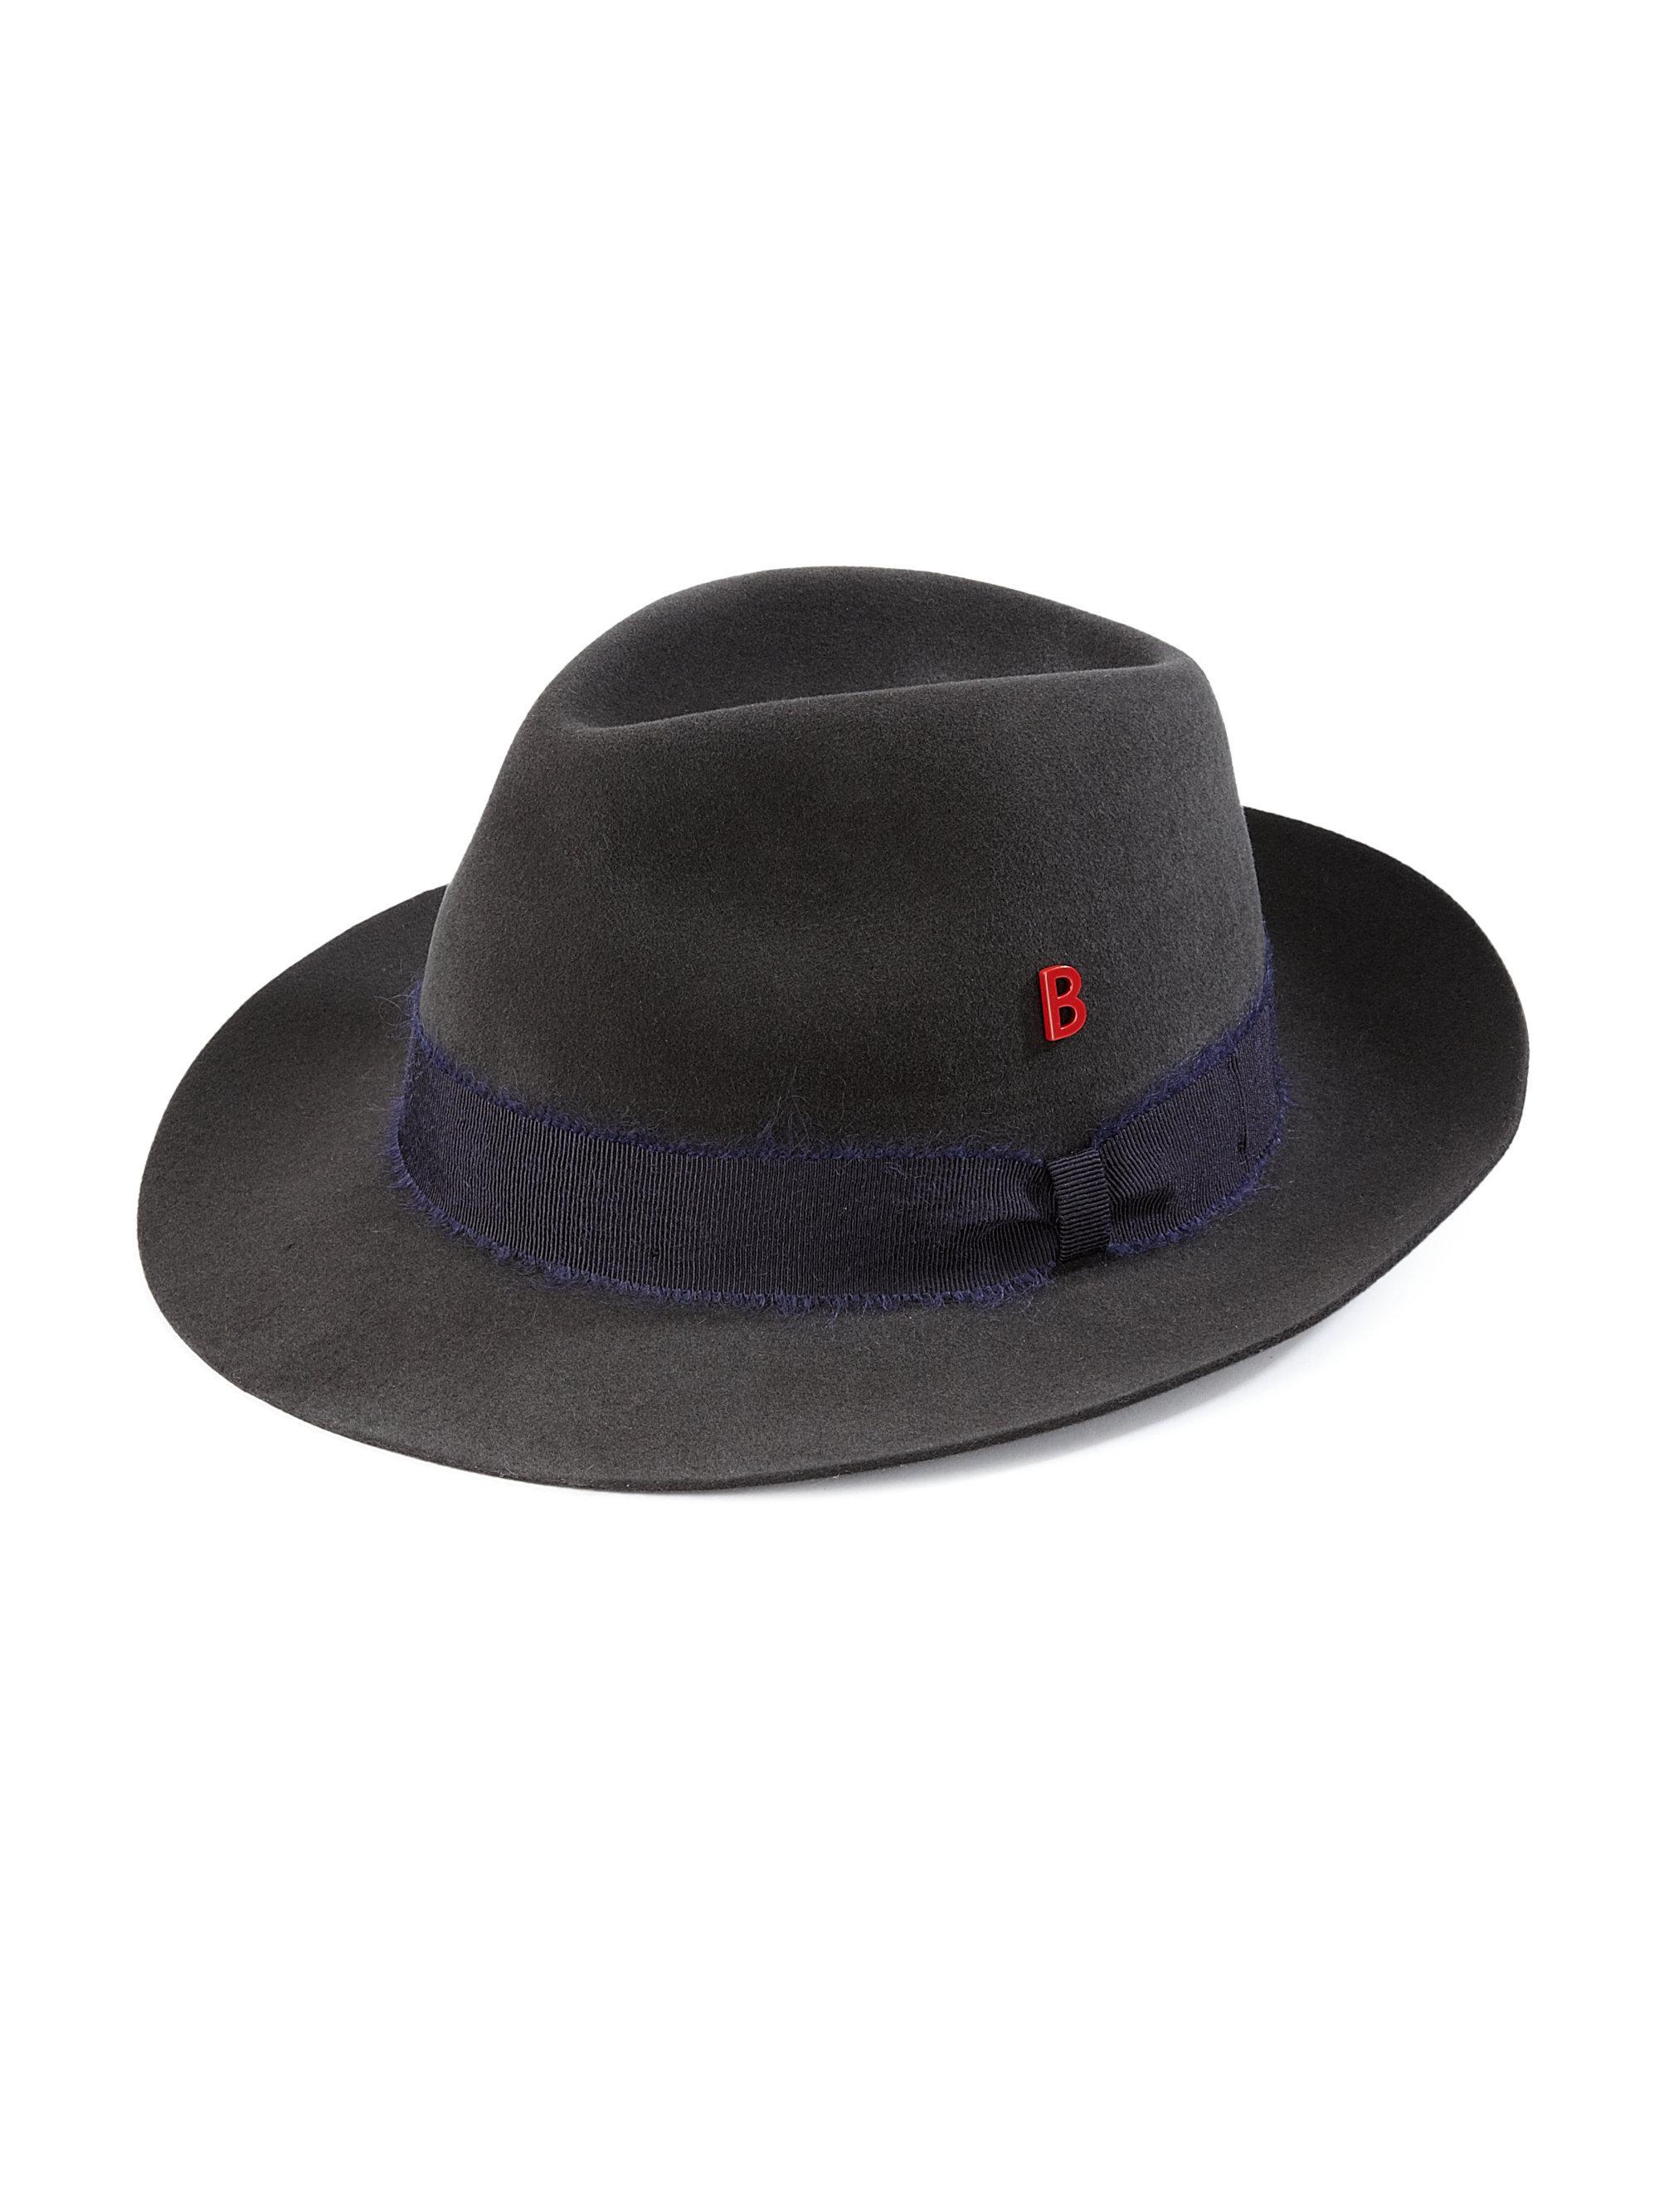 b0b91c22913c4 Lyst - My Bob Tribeca Fedora in Black for Men